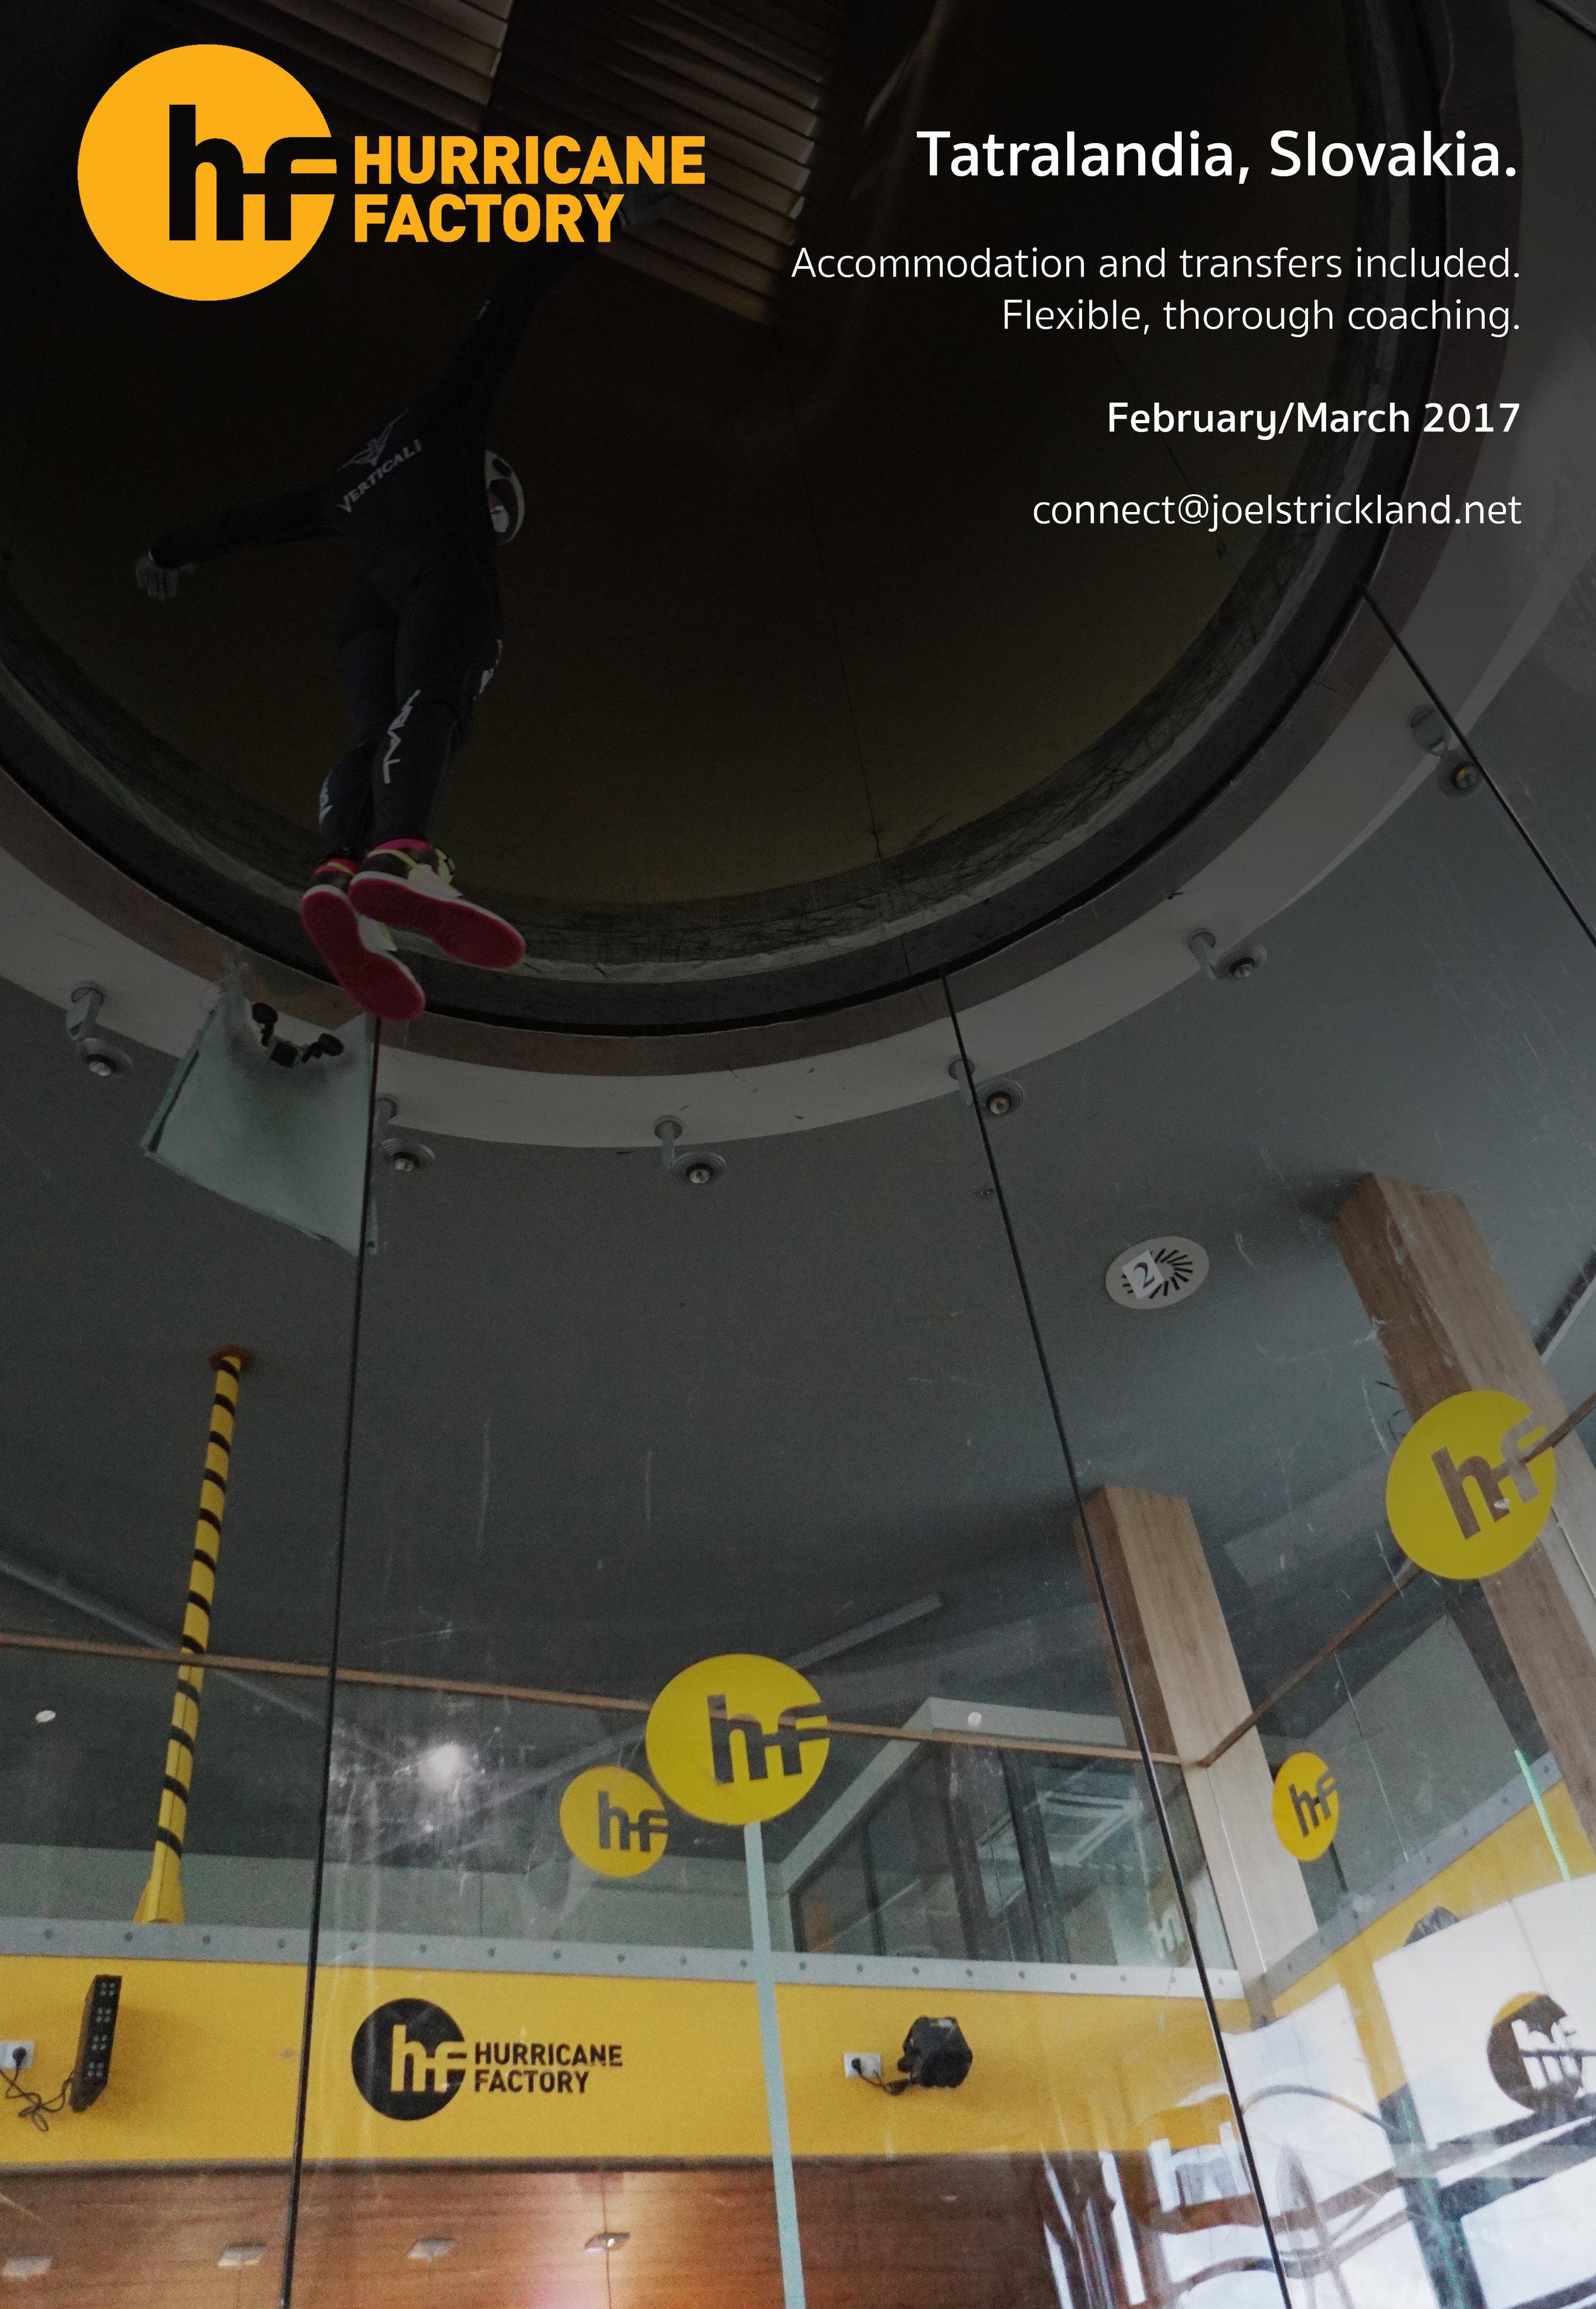 tunnel coaching hurricane factory slovakia